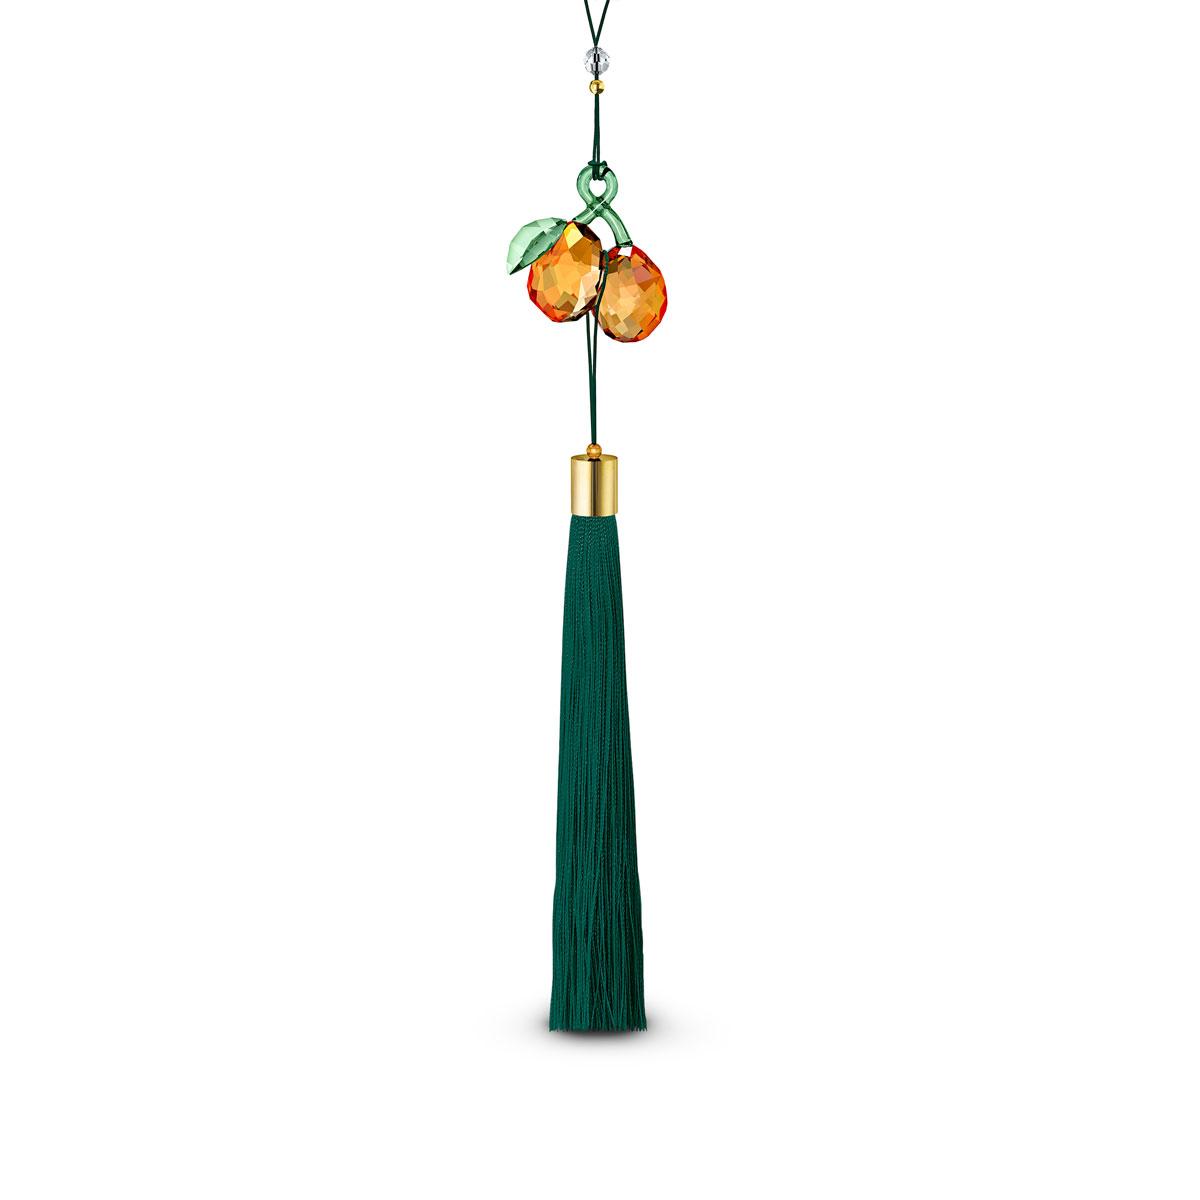 Swarovski Asian Symbols Ornament Kumquat